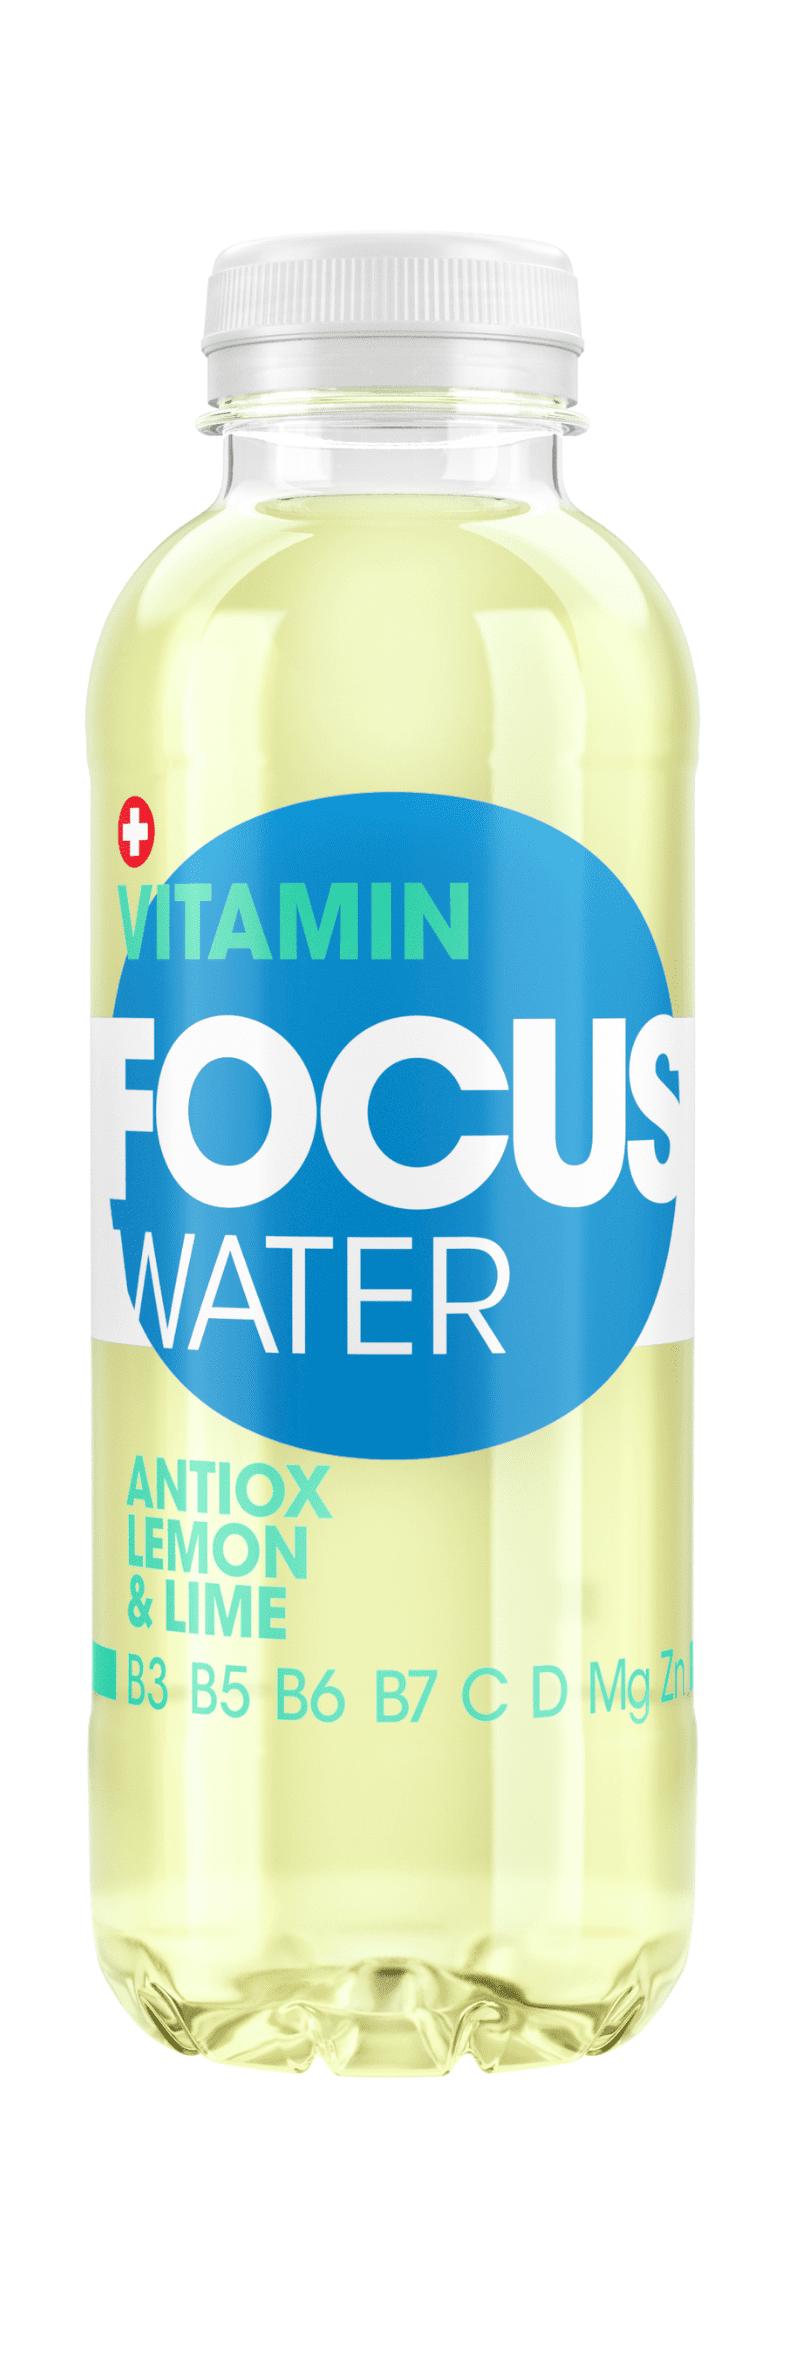 Focuswater Antiox Bottle